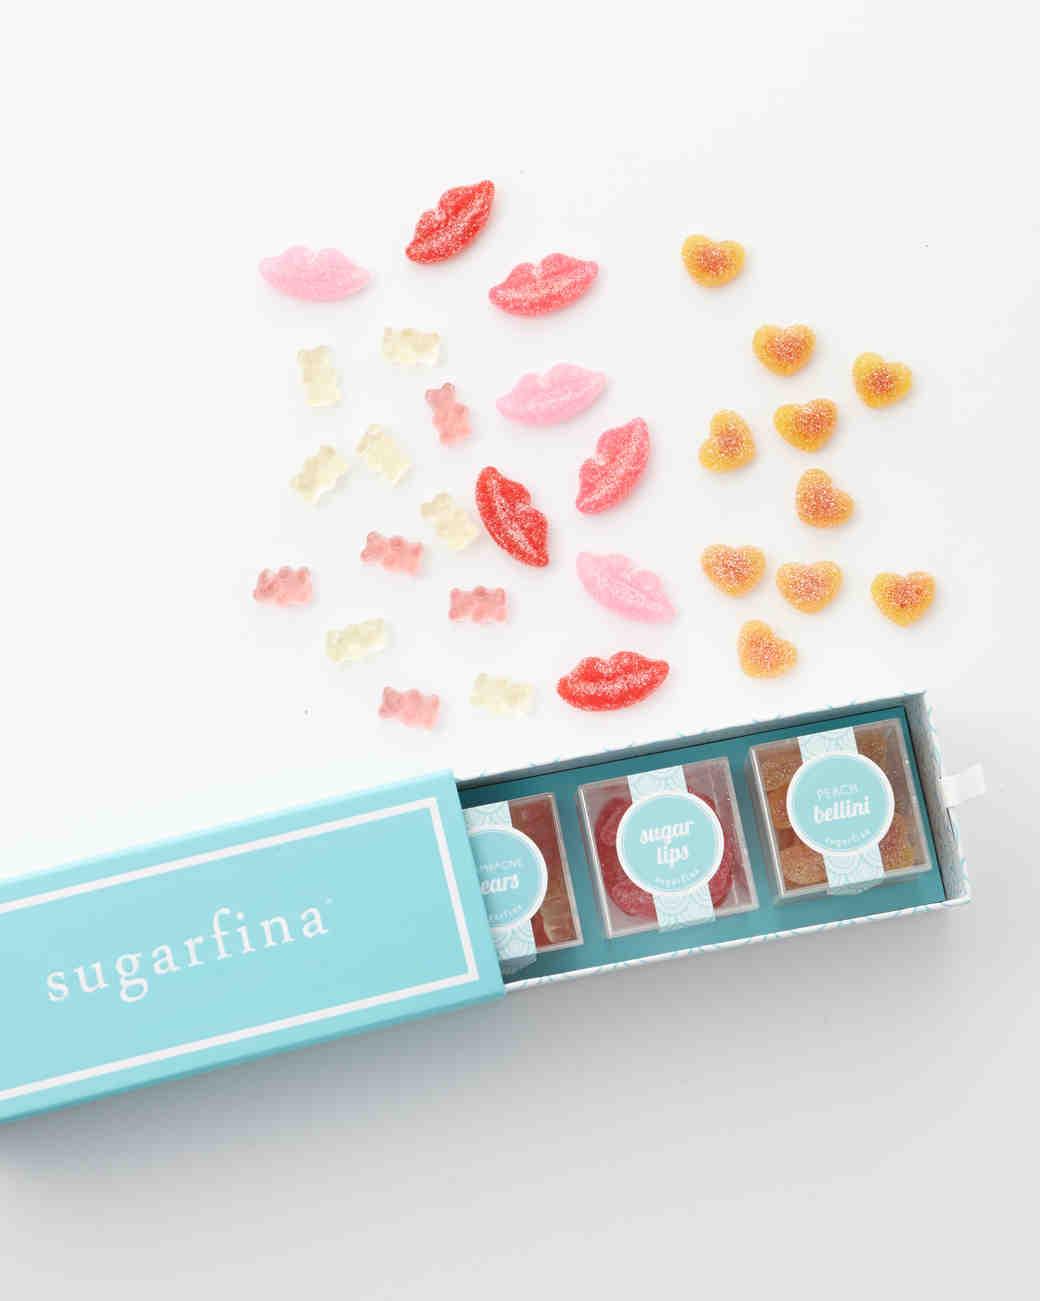 bachelorette-party-sugarfina-candy-0015-d112027-0315.jpg